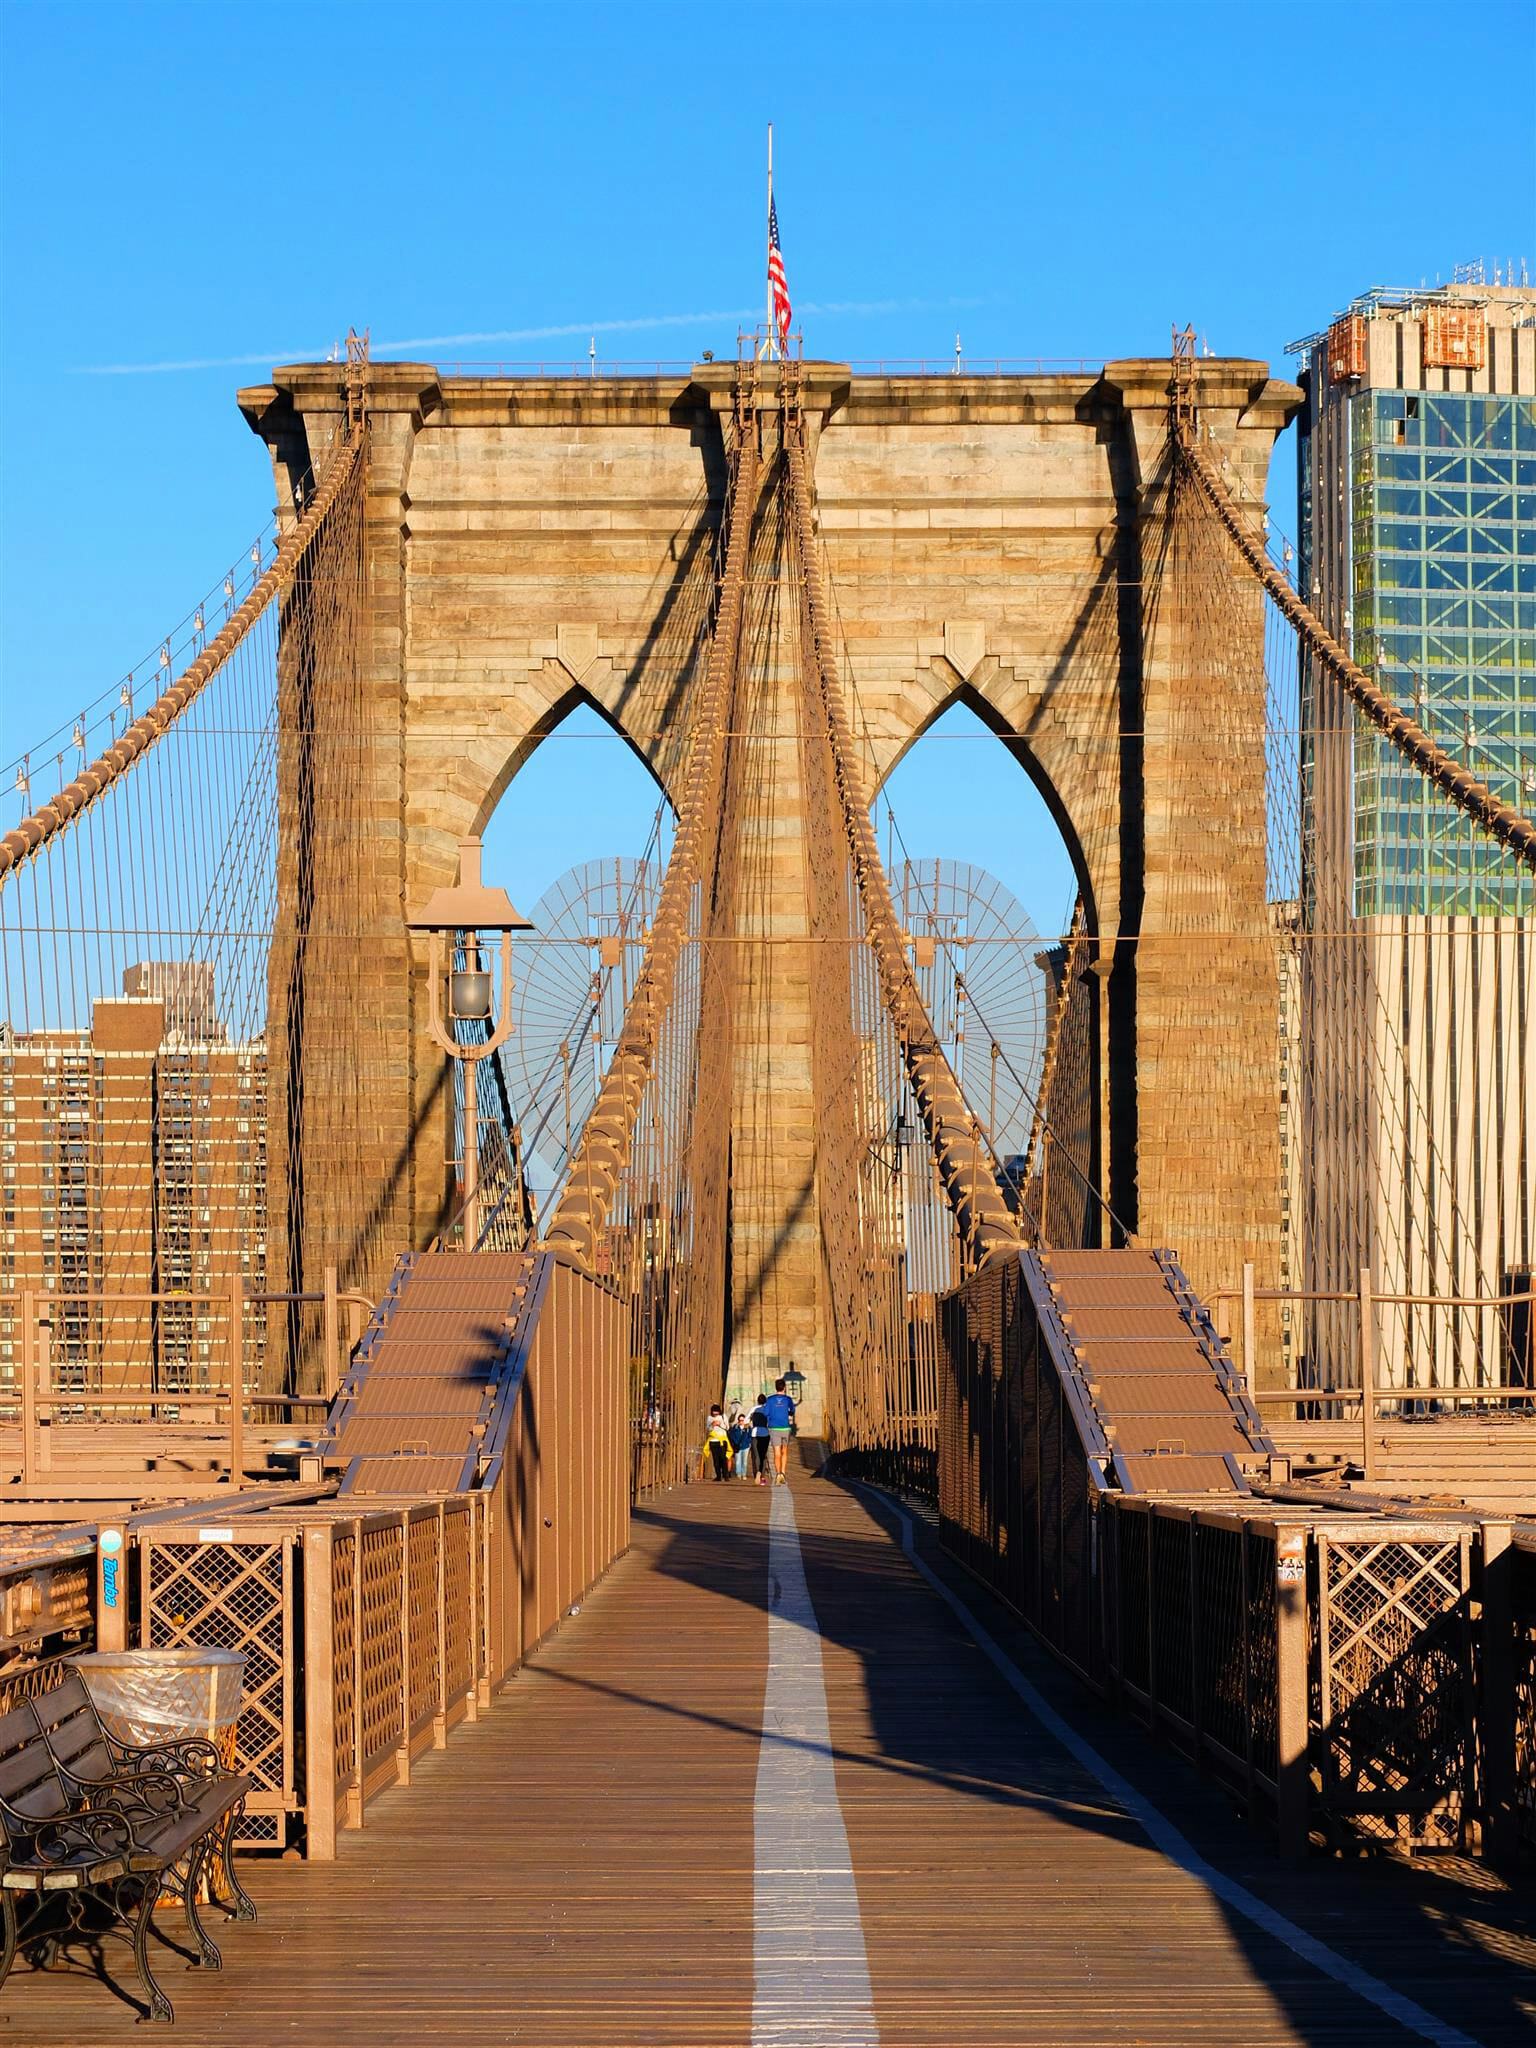 Brooklyn Bridge in New York High Quality Wallpaper